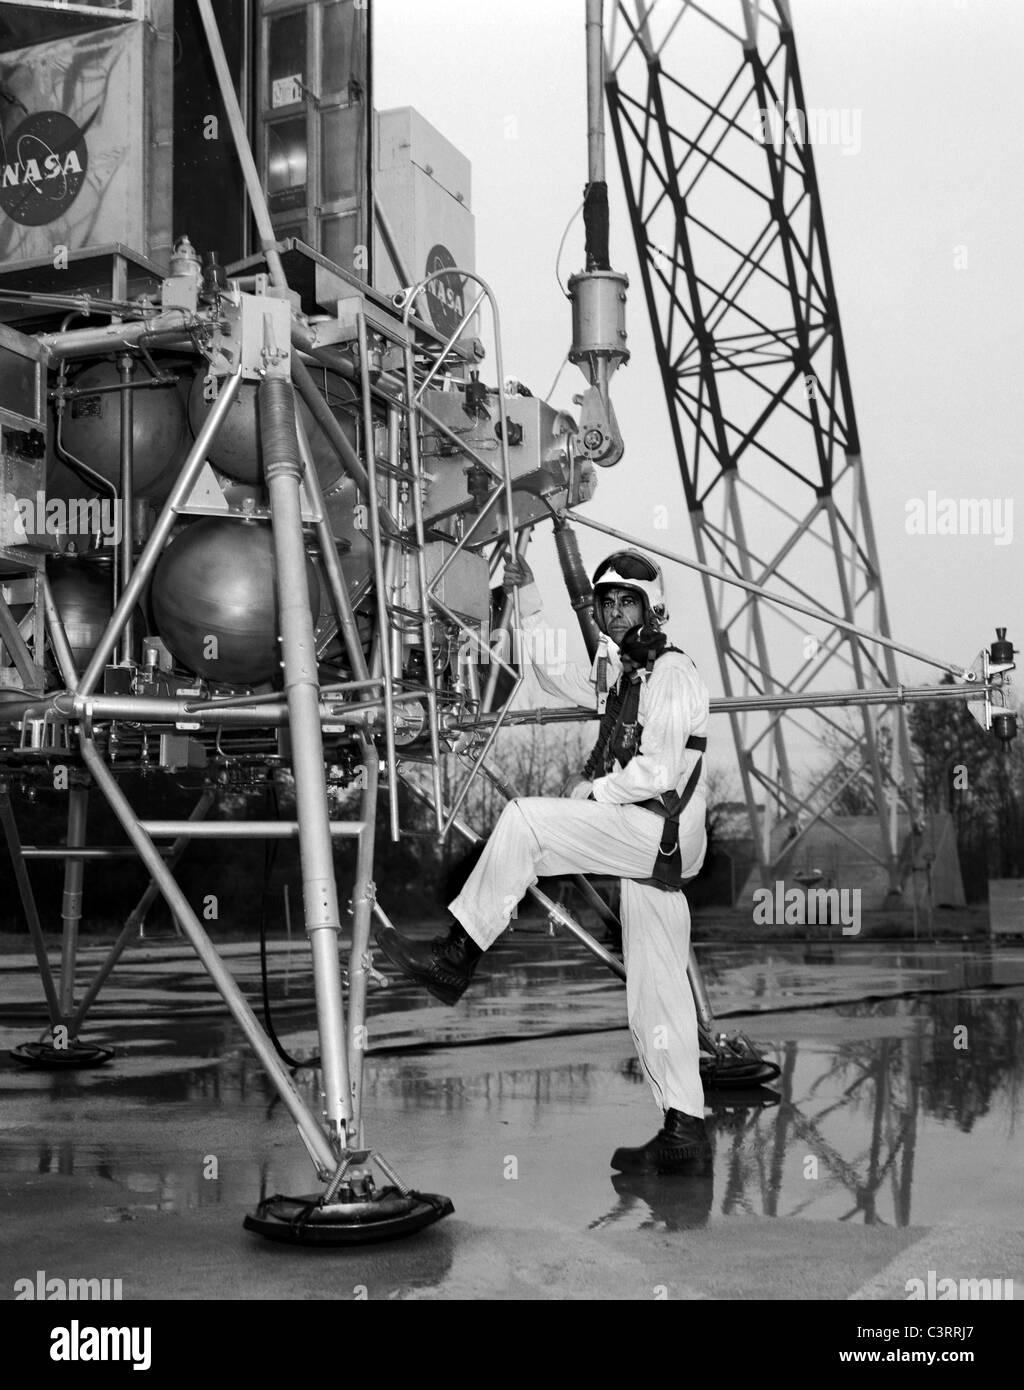 Alan Shepard At Lunar Landing Research Facility. - Stock Image